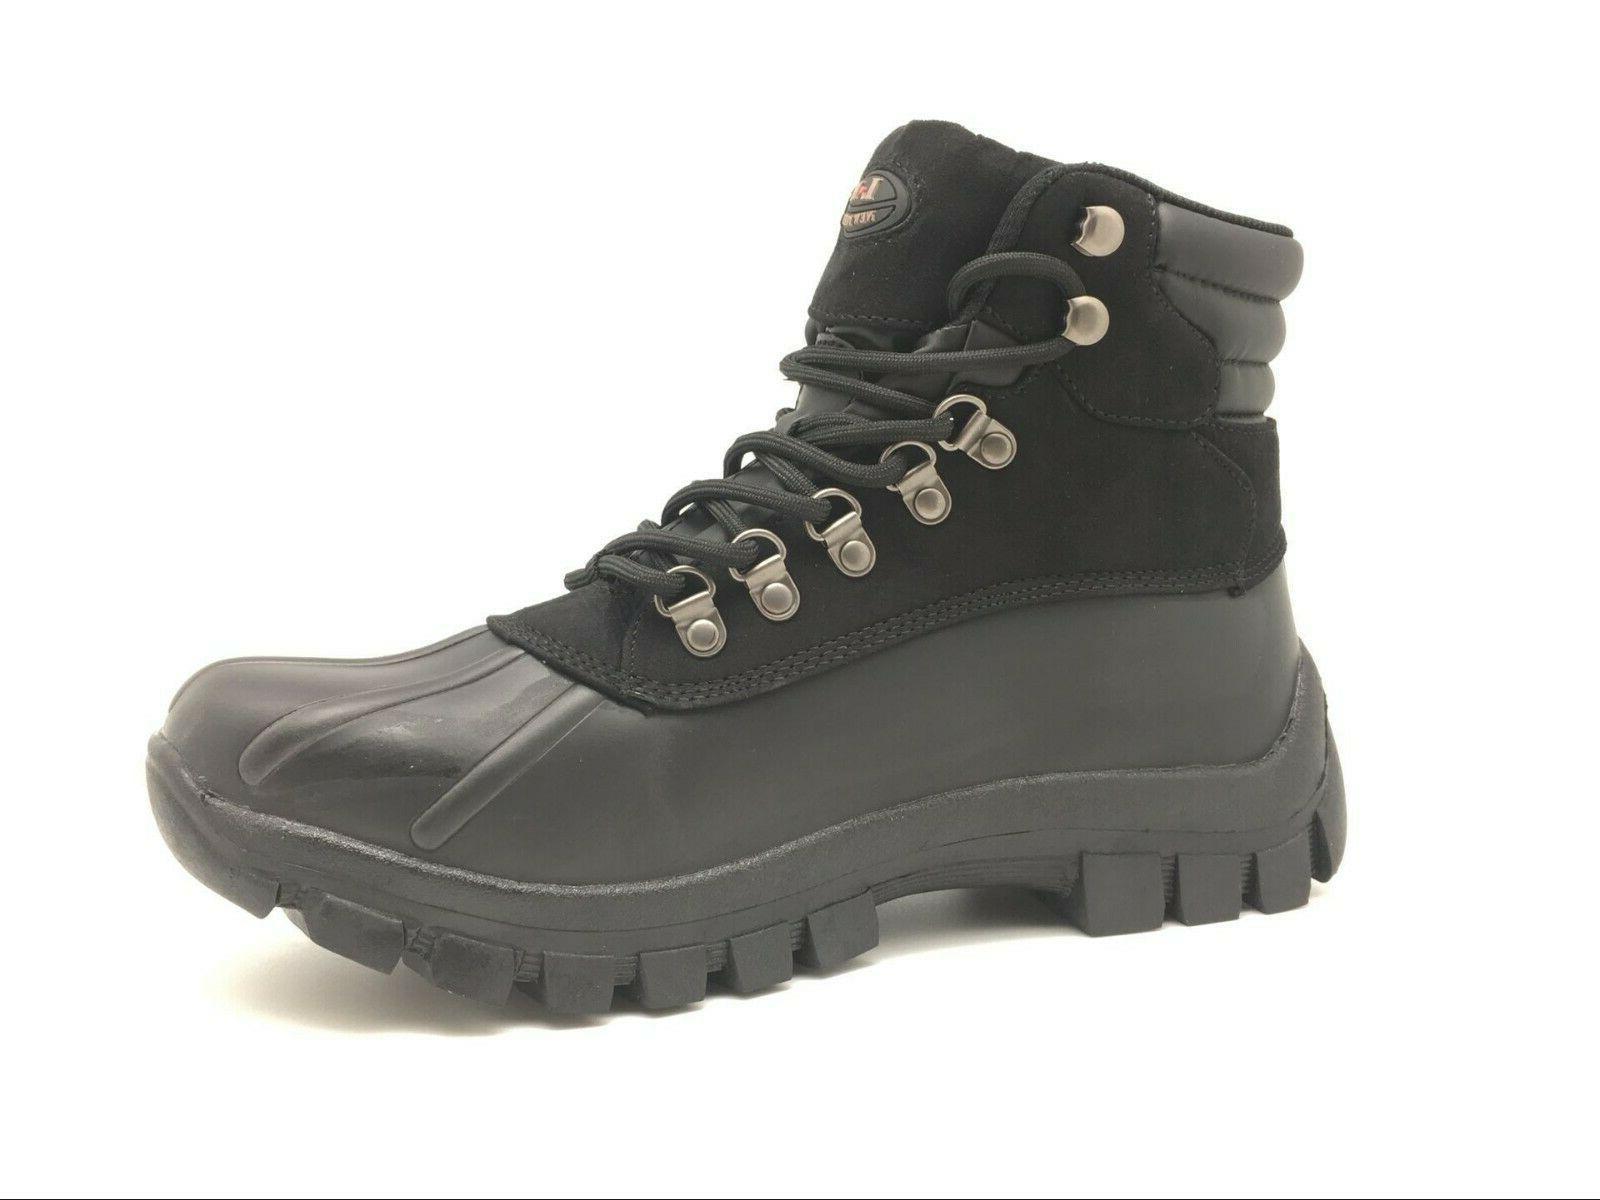 LM Boots Genuine Waterproof